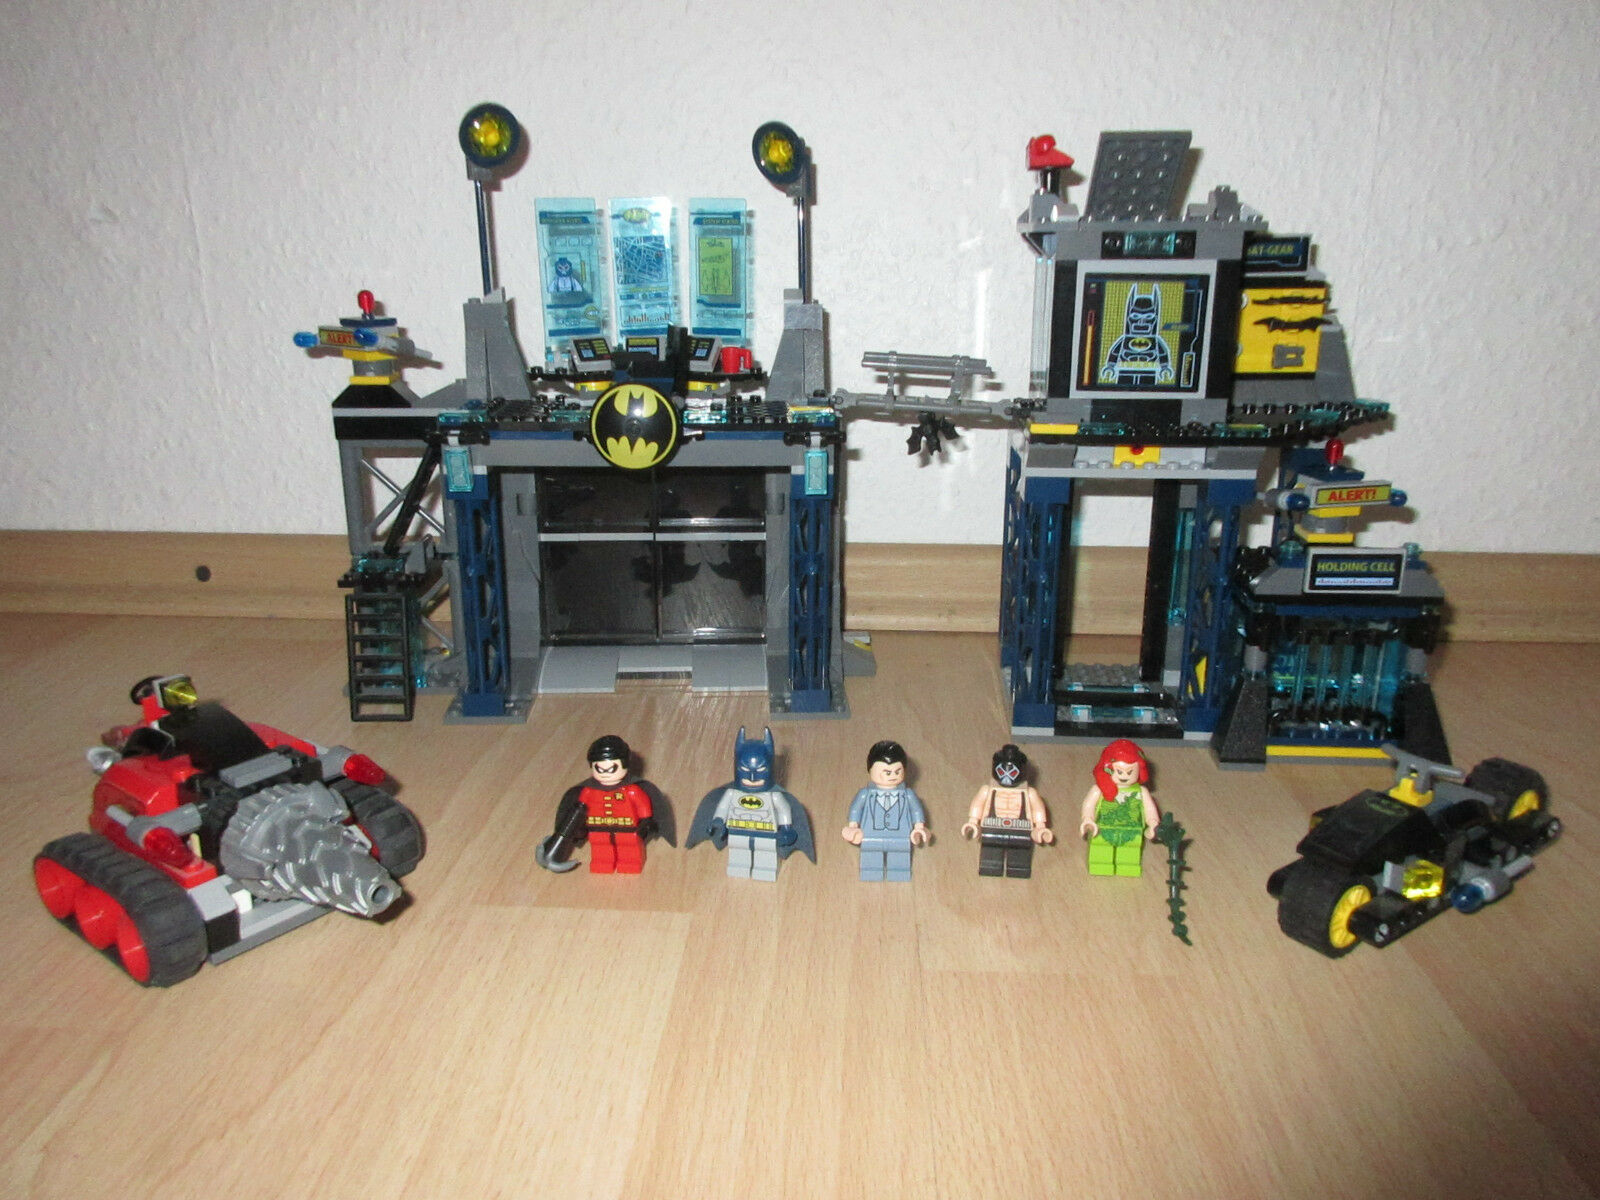 LEGO Super Heroes 6860 - The Batcave (6860)